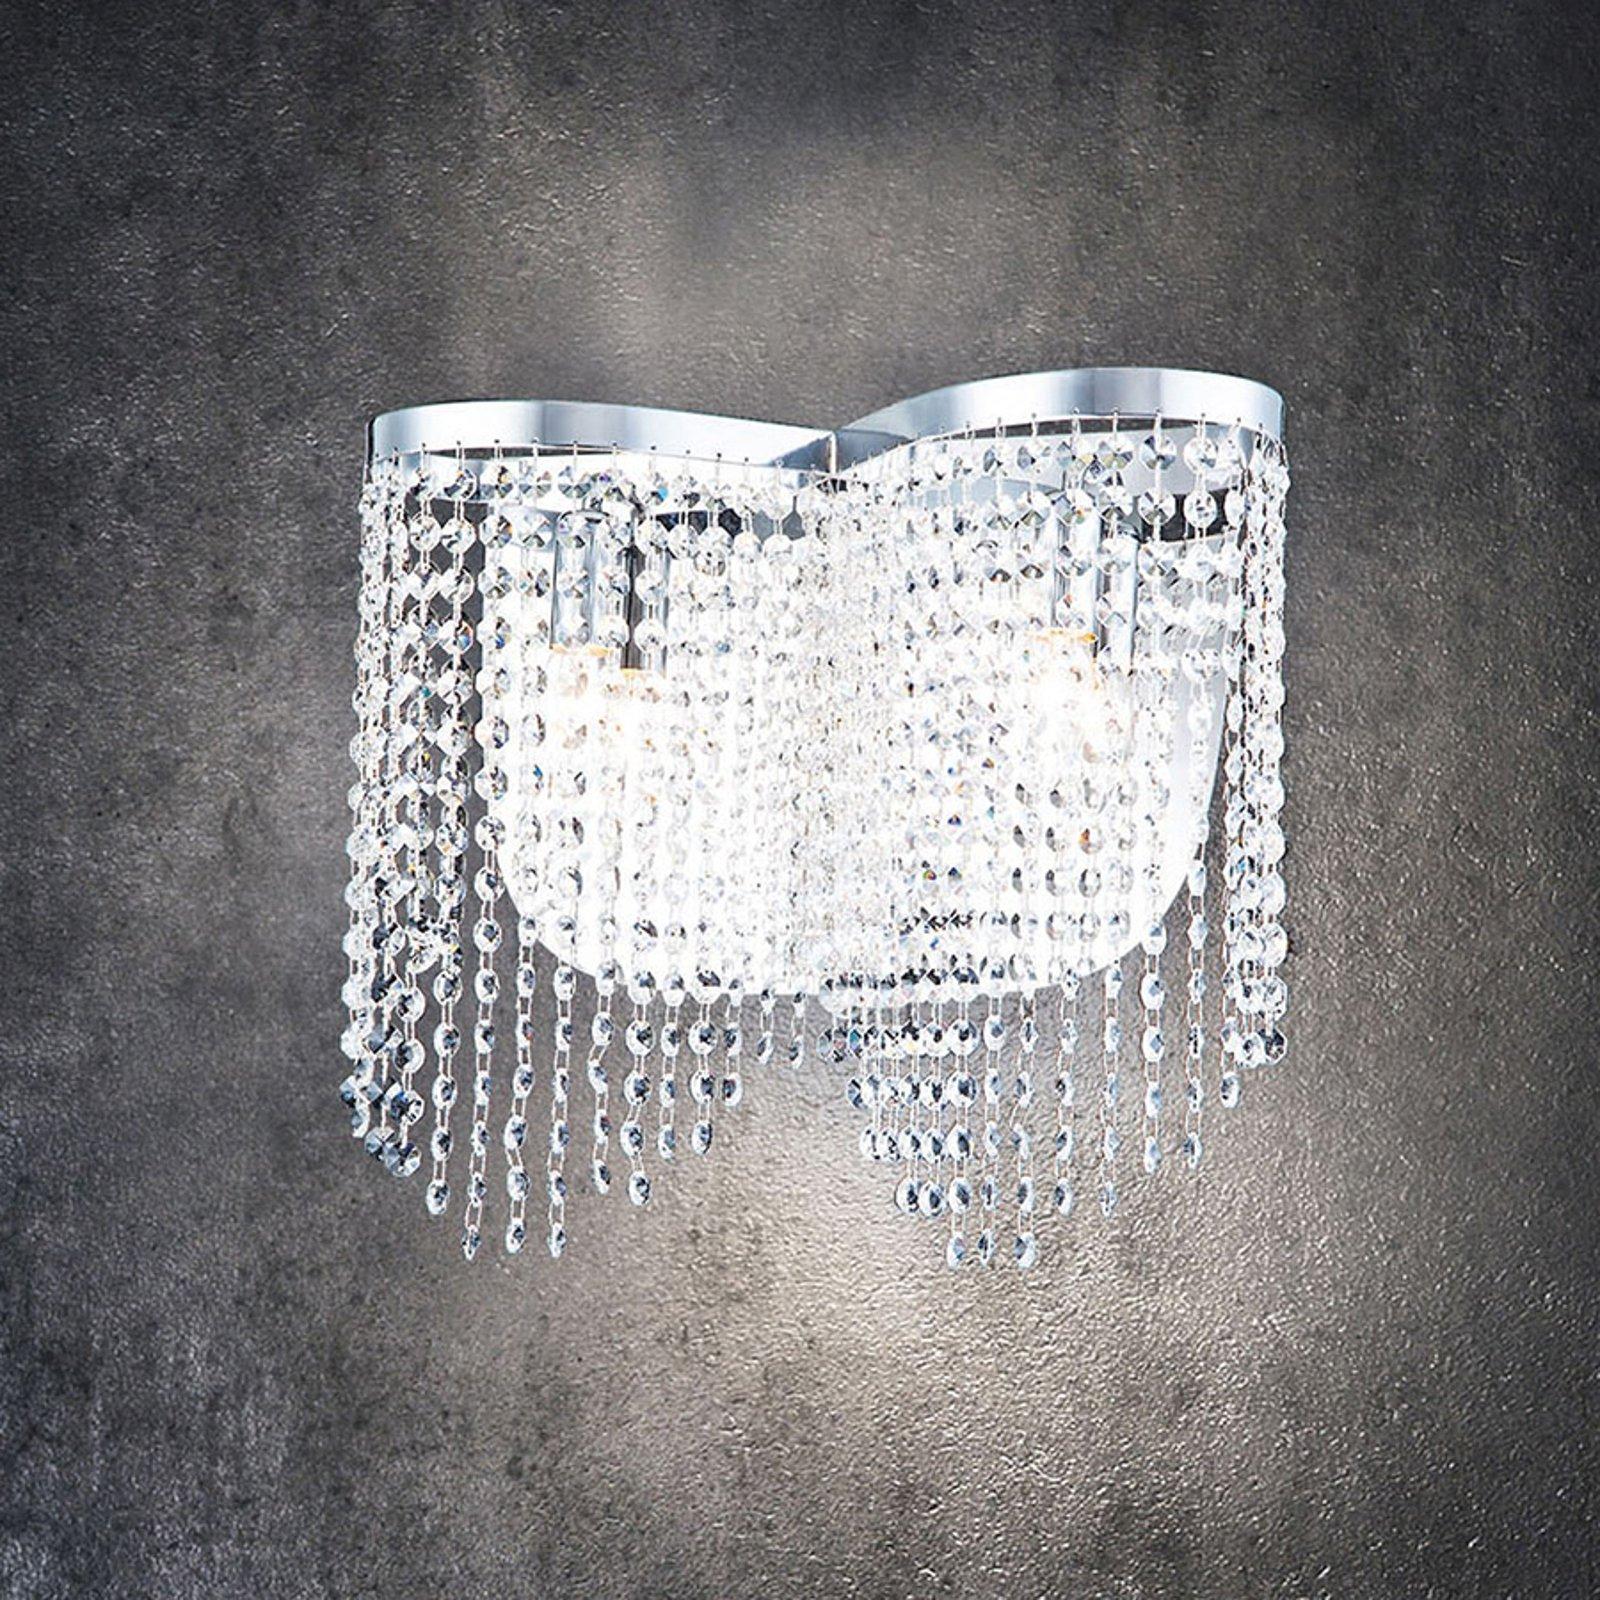 Toils krystall-vegglampe